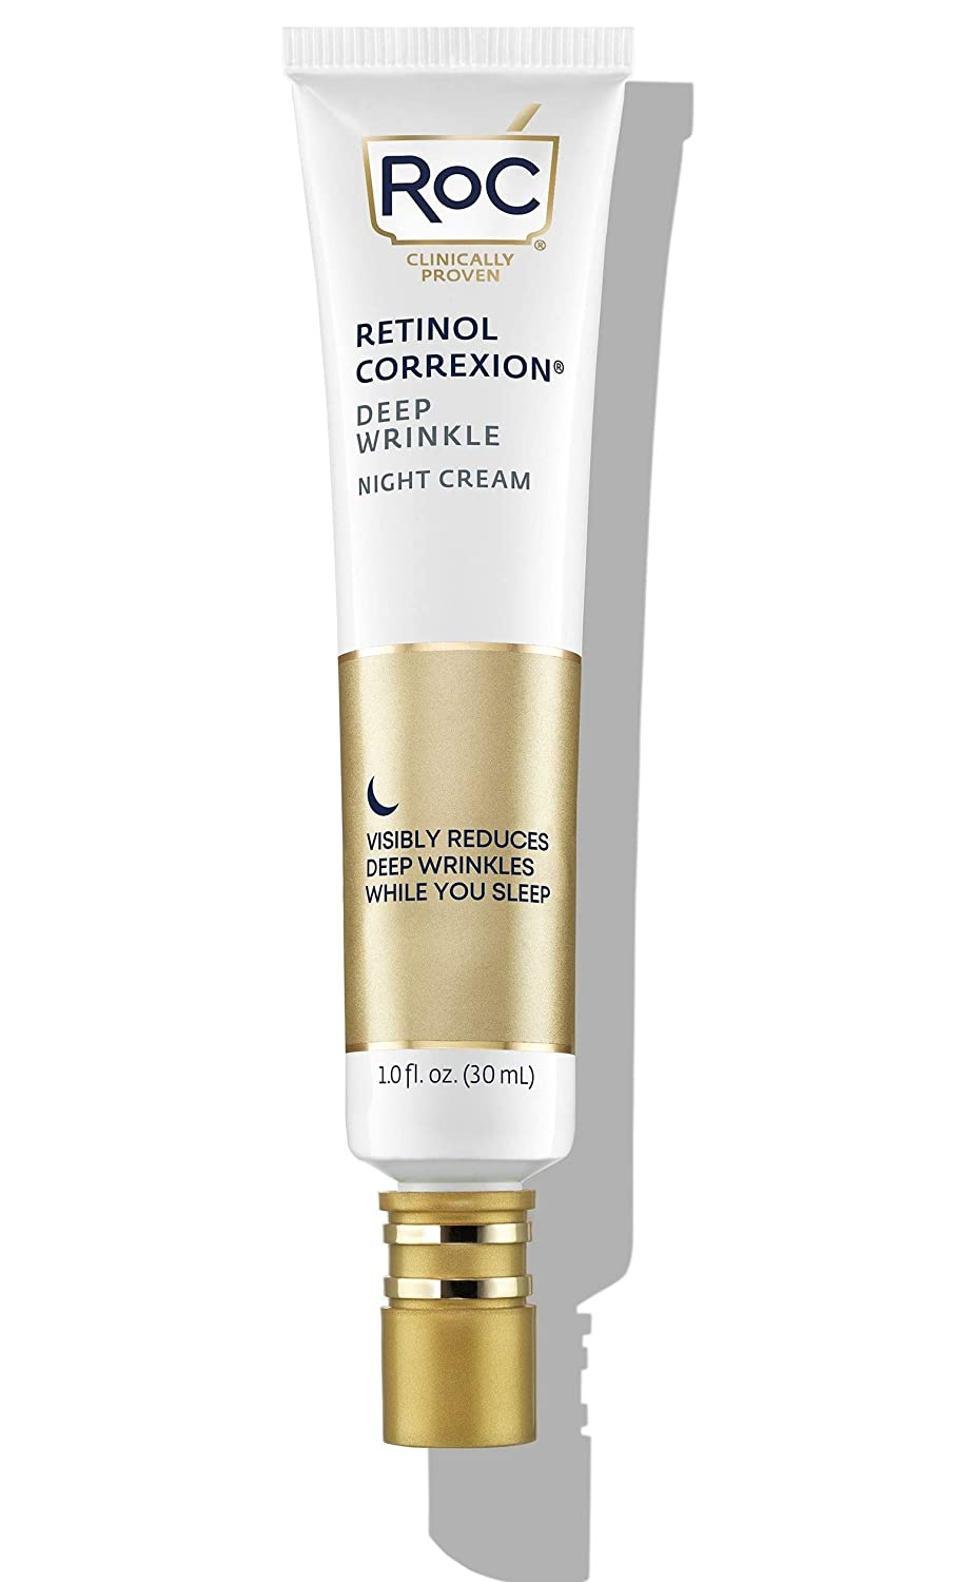 Roc Deep Wrinkle Anti-Aging Night Cream